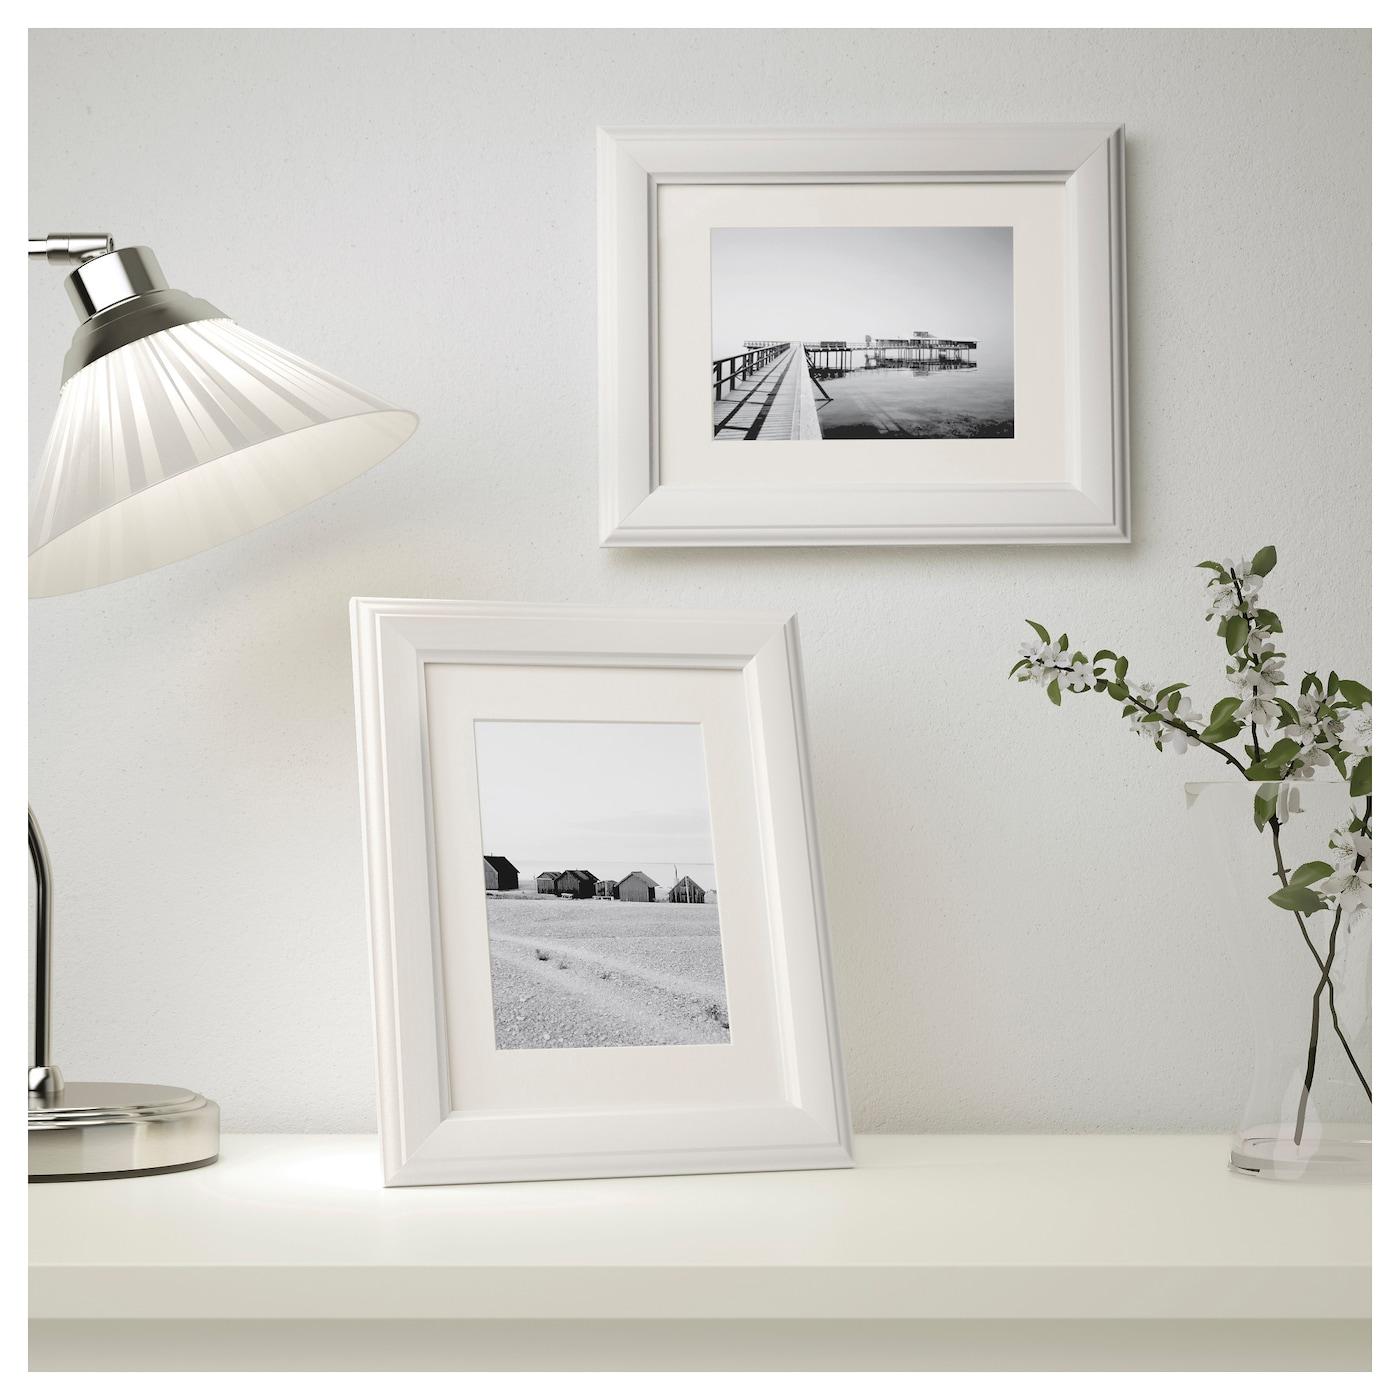 virserum frame white 18x24 cm ikea. Black Bedroom Furniture Sets. Home Design Ideas